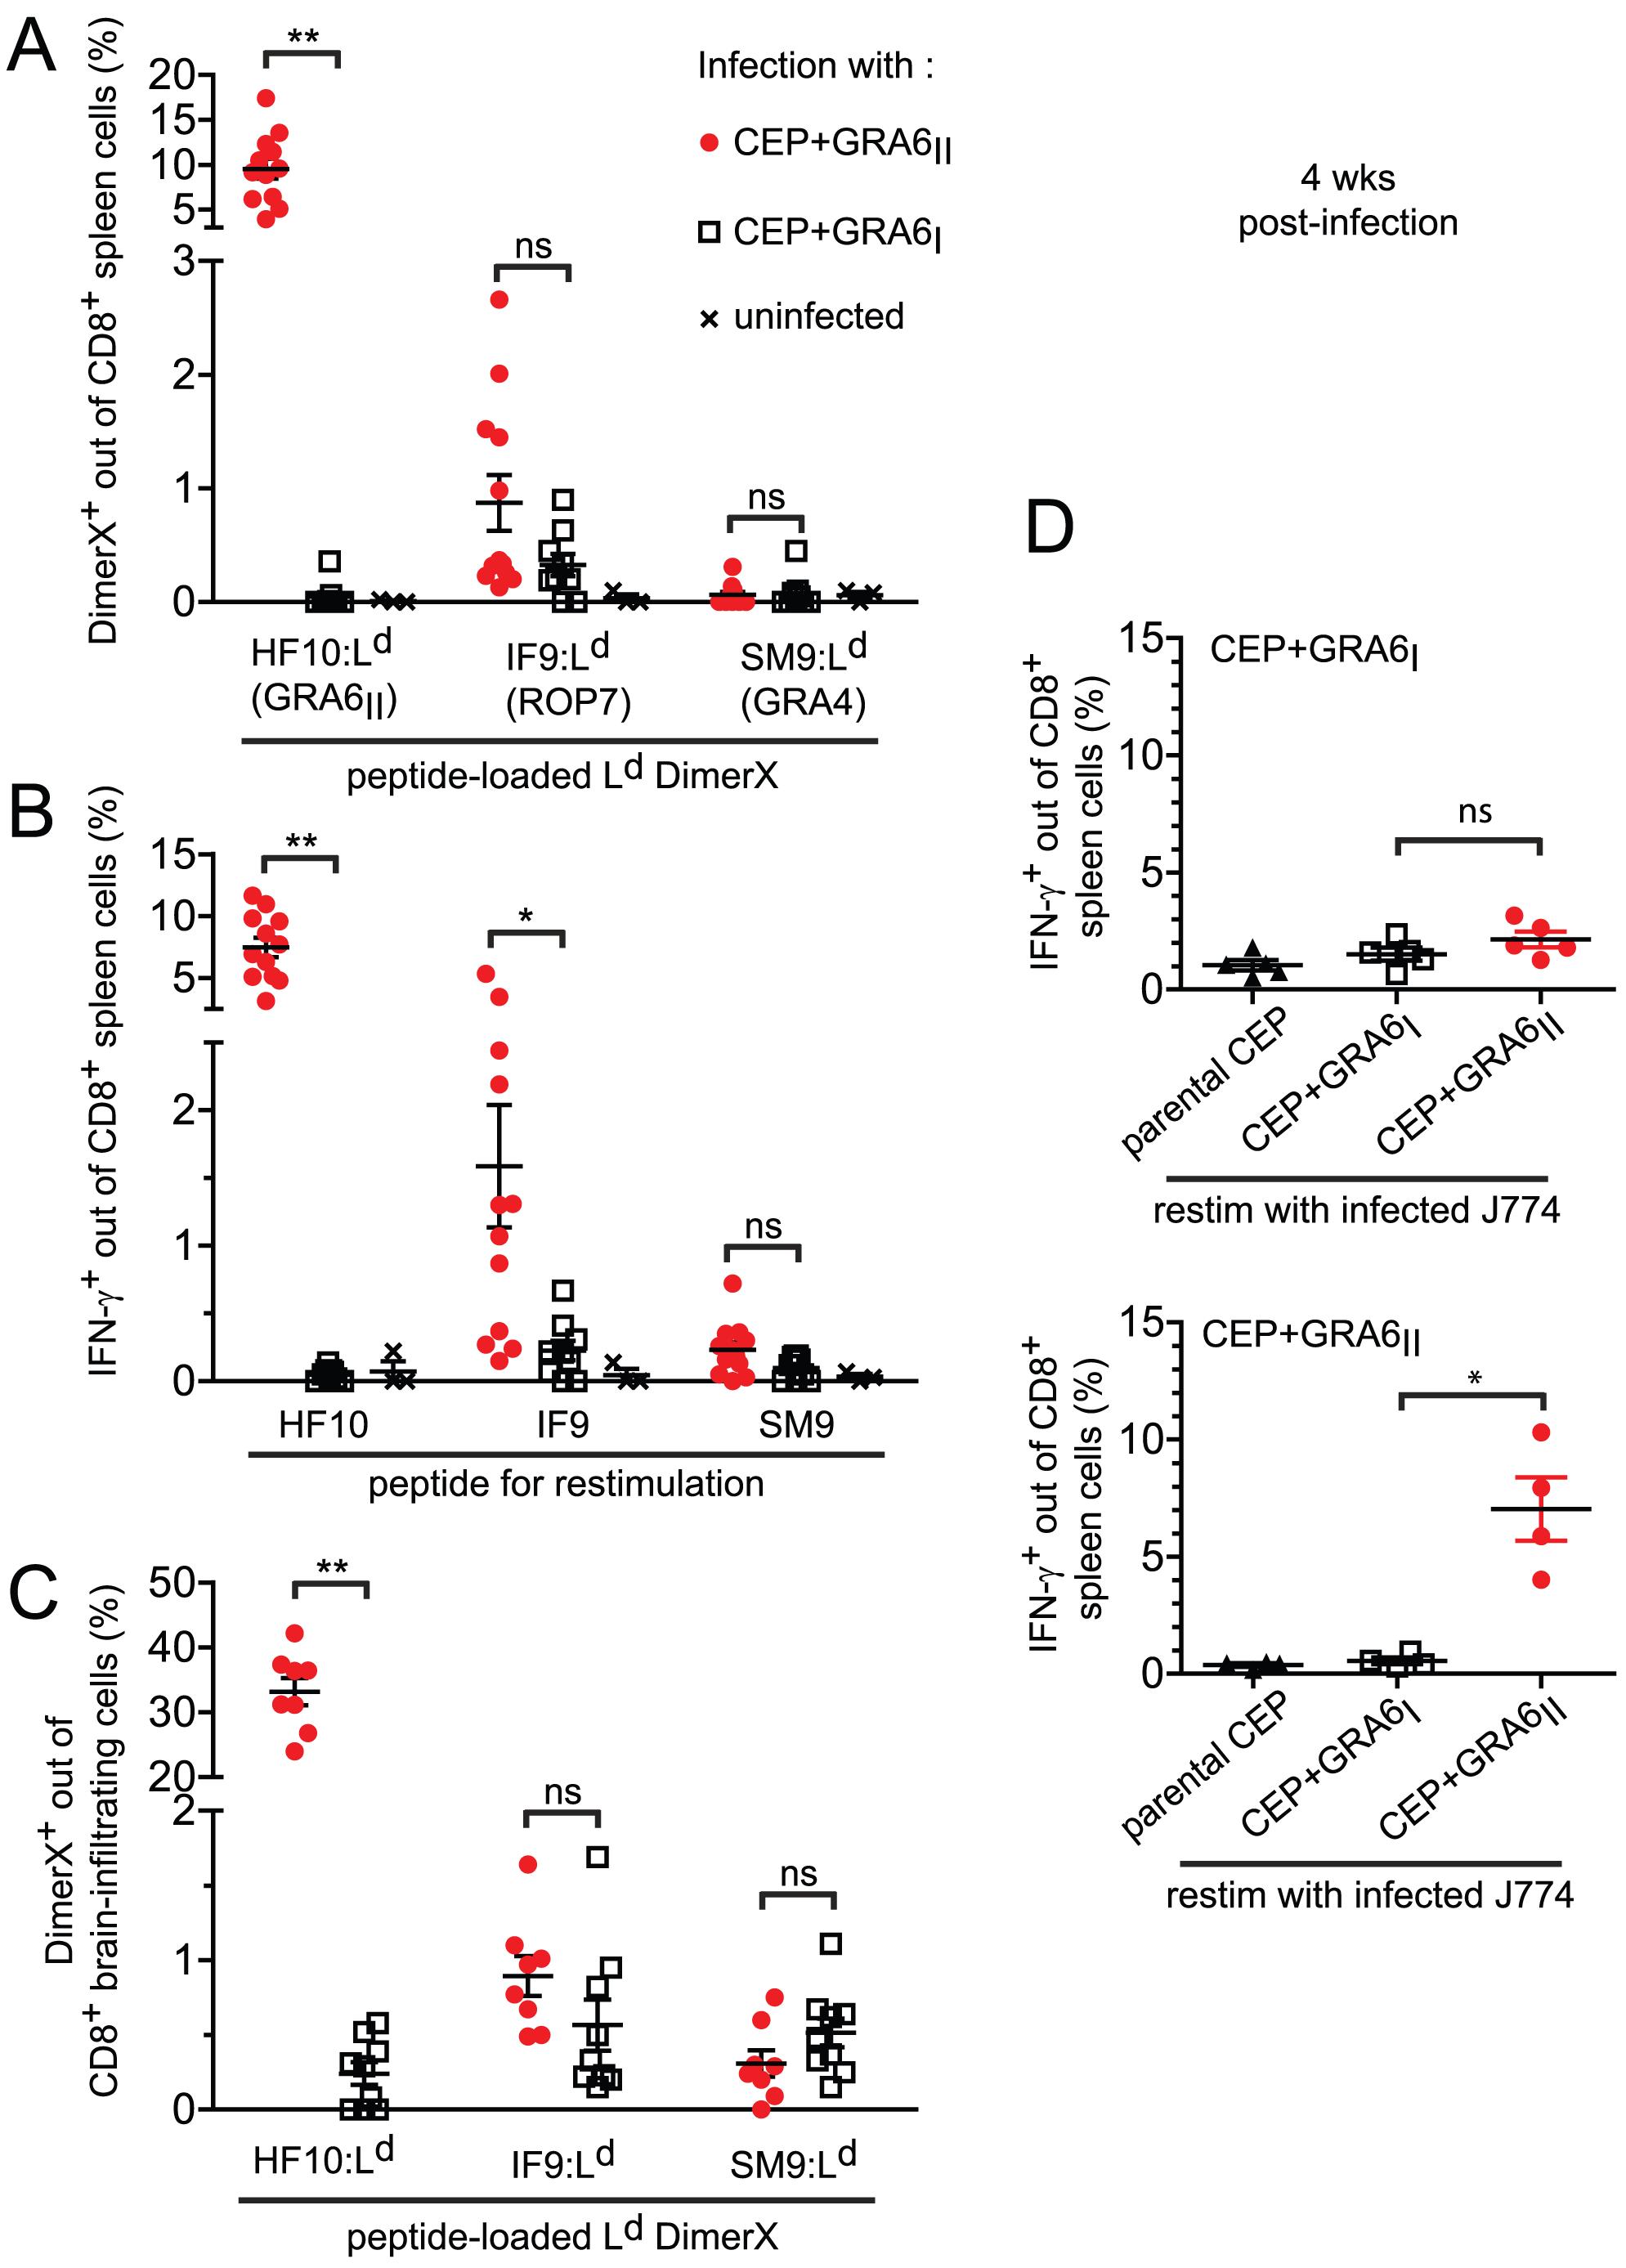 Immunodominance, but not immunodomination, of the GRA6<sub>II</sub>-derived HF10 peptide during chronic stage.